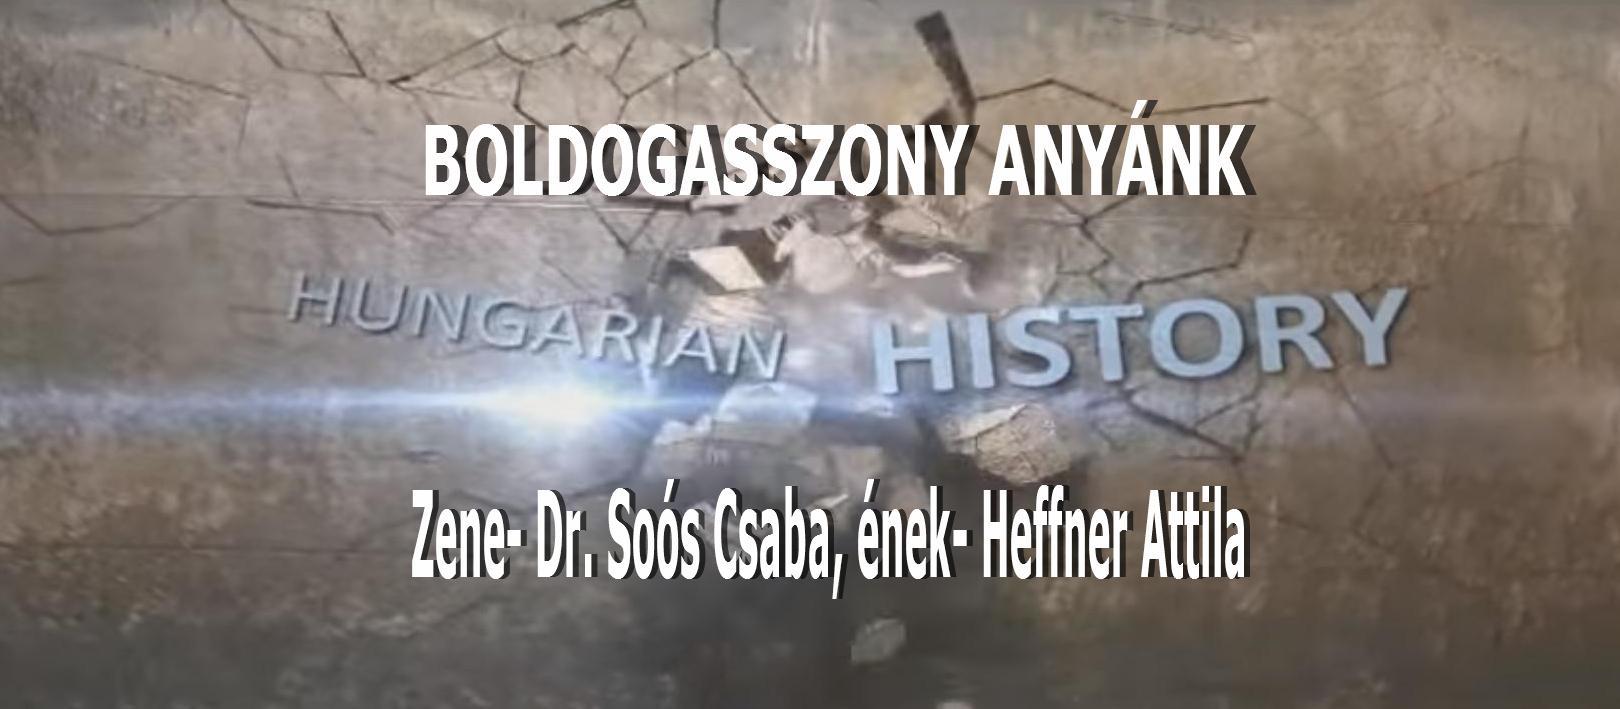 film: HUNGARIAN HISTORi